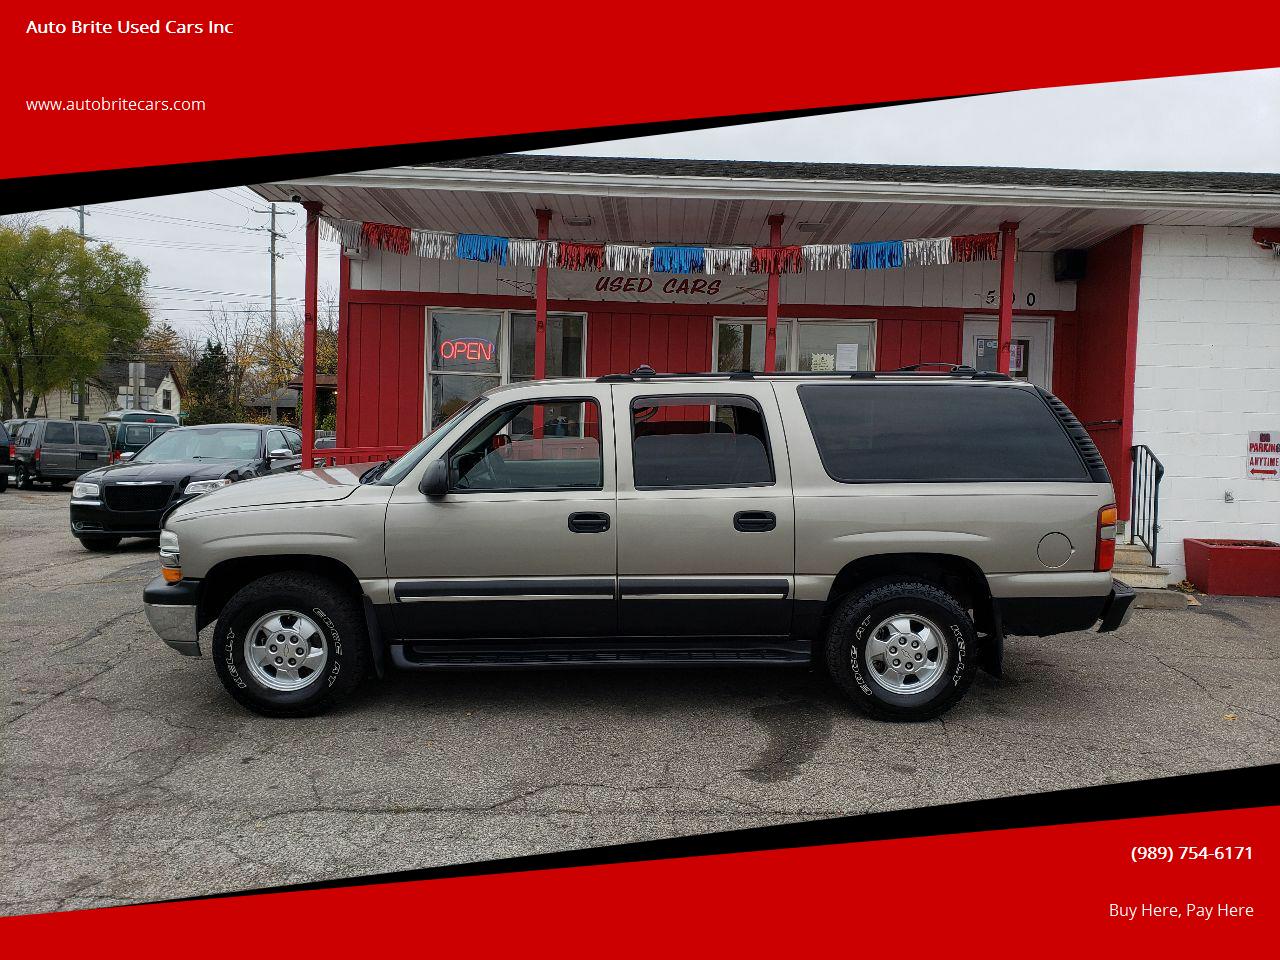 awwnvbgz6o1fhm https www carsforsale com 2003 chevrolet suburban for sale c139513